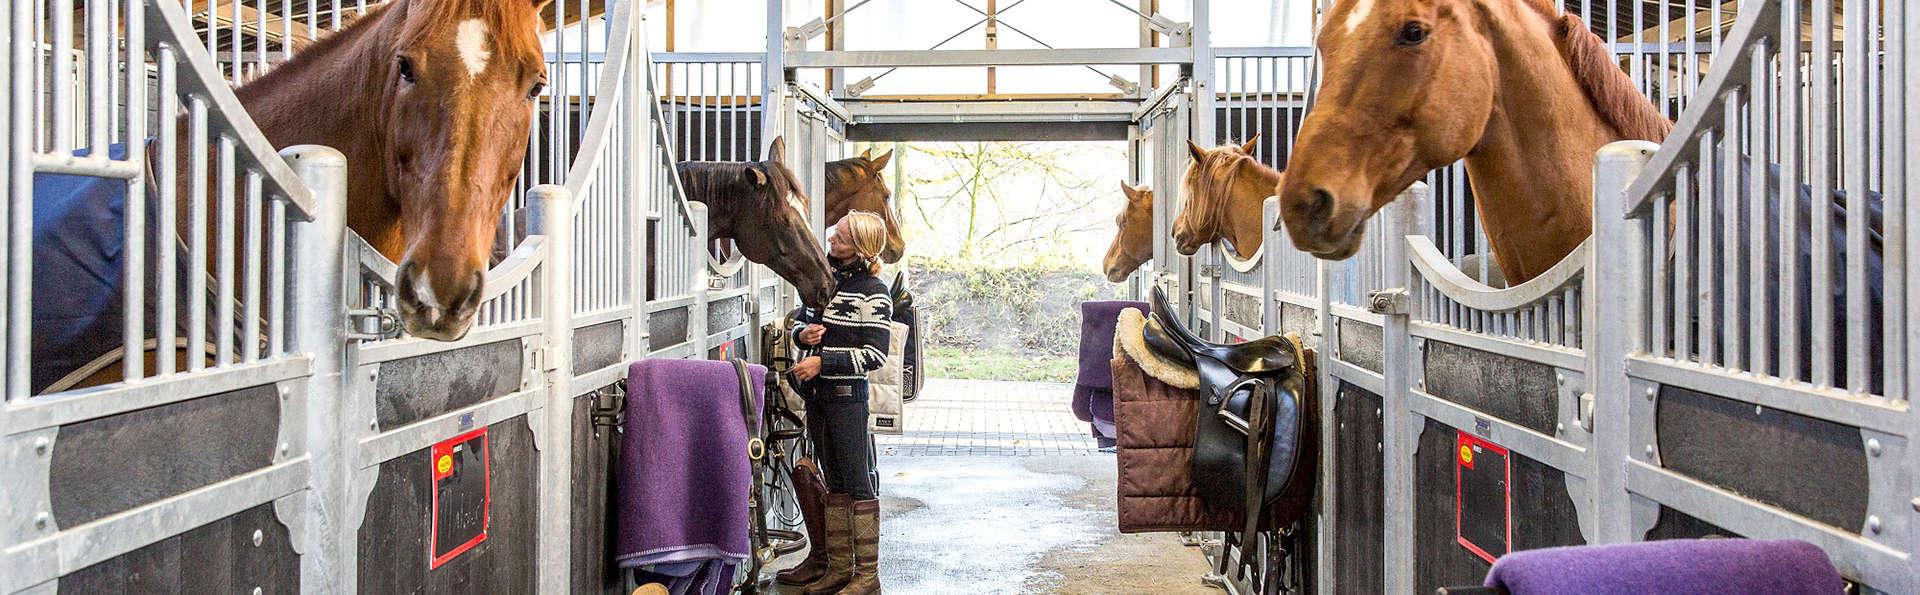 Van der Valk Apeldoorn - de Cantharel - EDIT_N3_HORSE.jpg